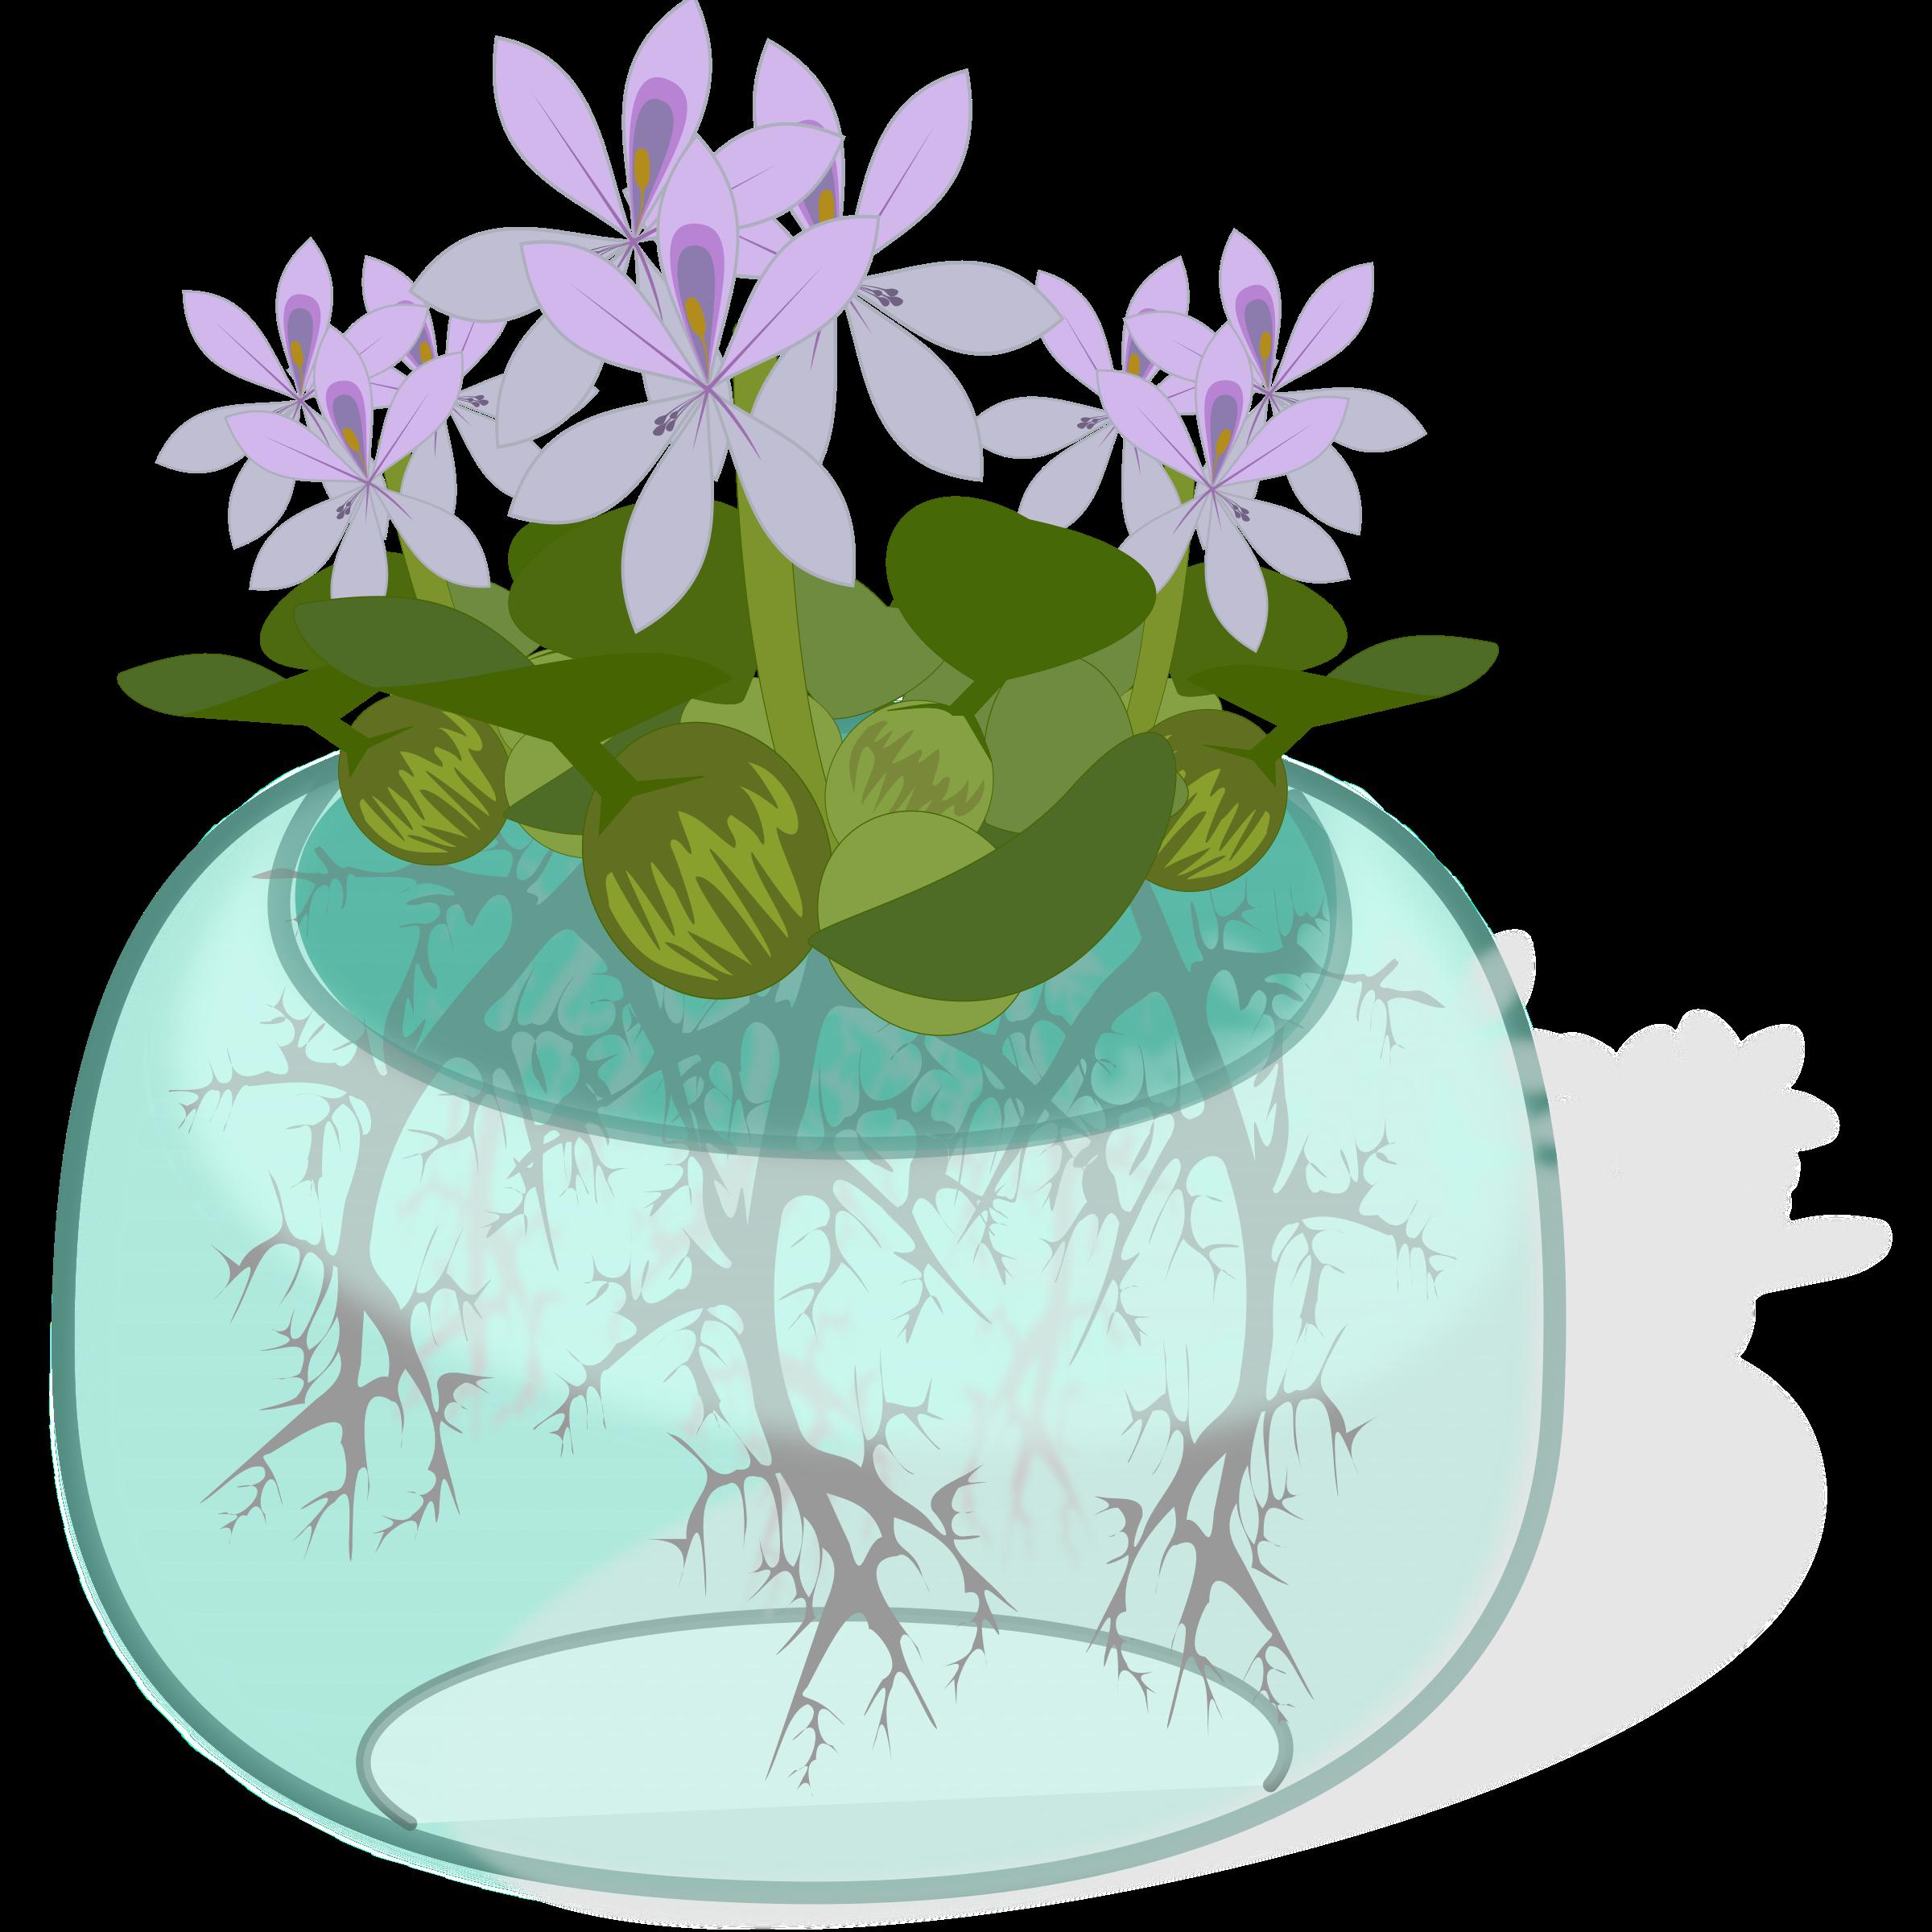 Water plant big image. Planting clipart violet